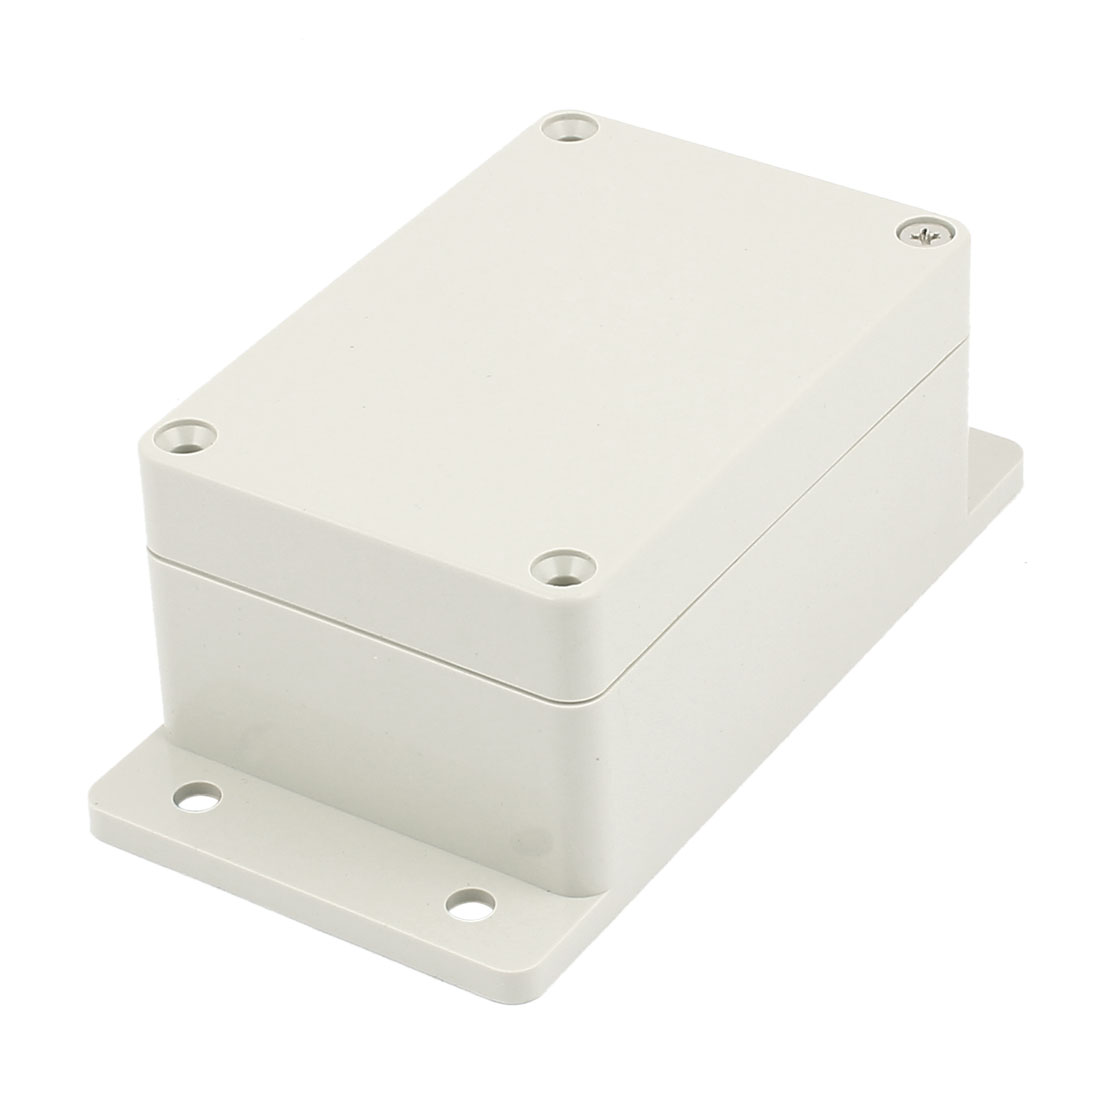 132mm x 69mm x 50mm Plastic Enclosure Case Junction Box Light Gray